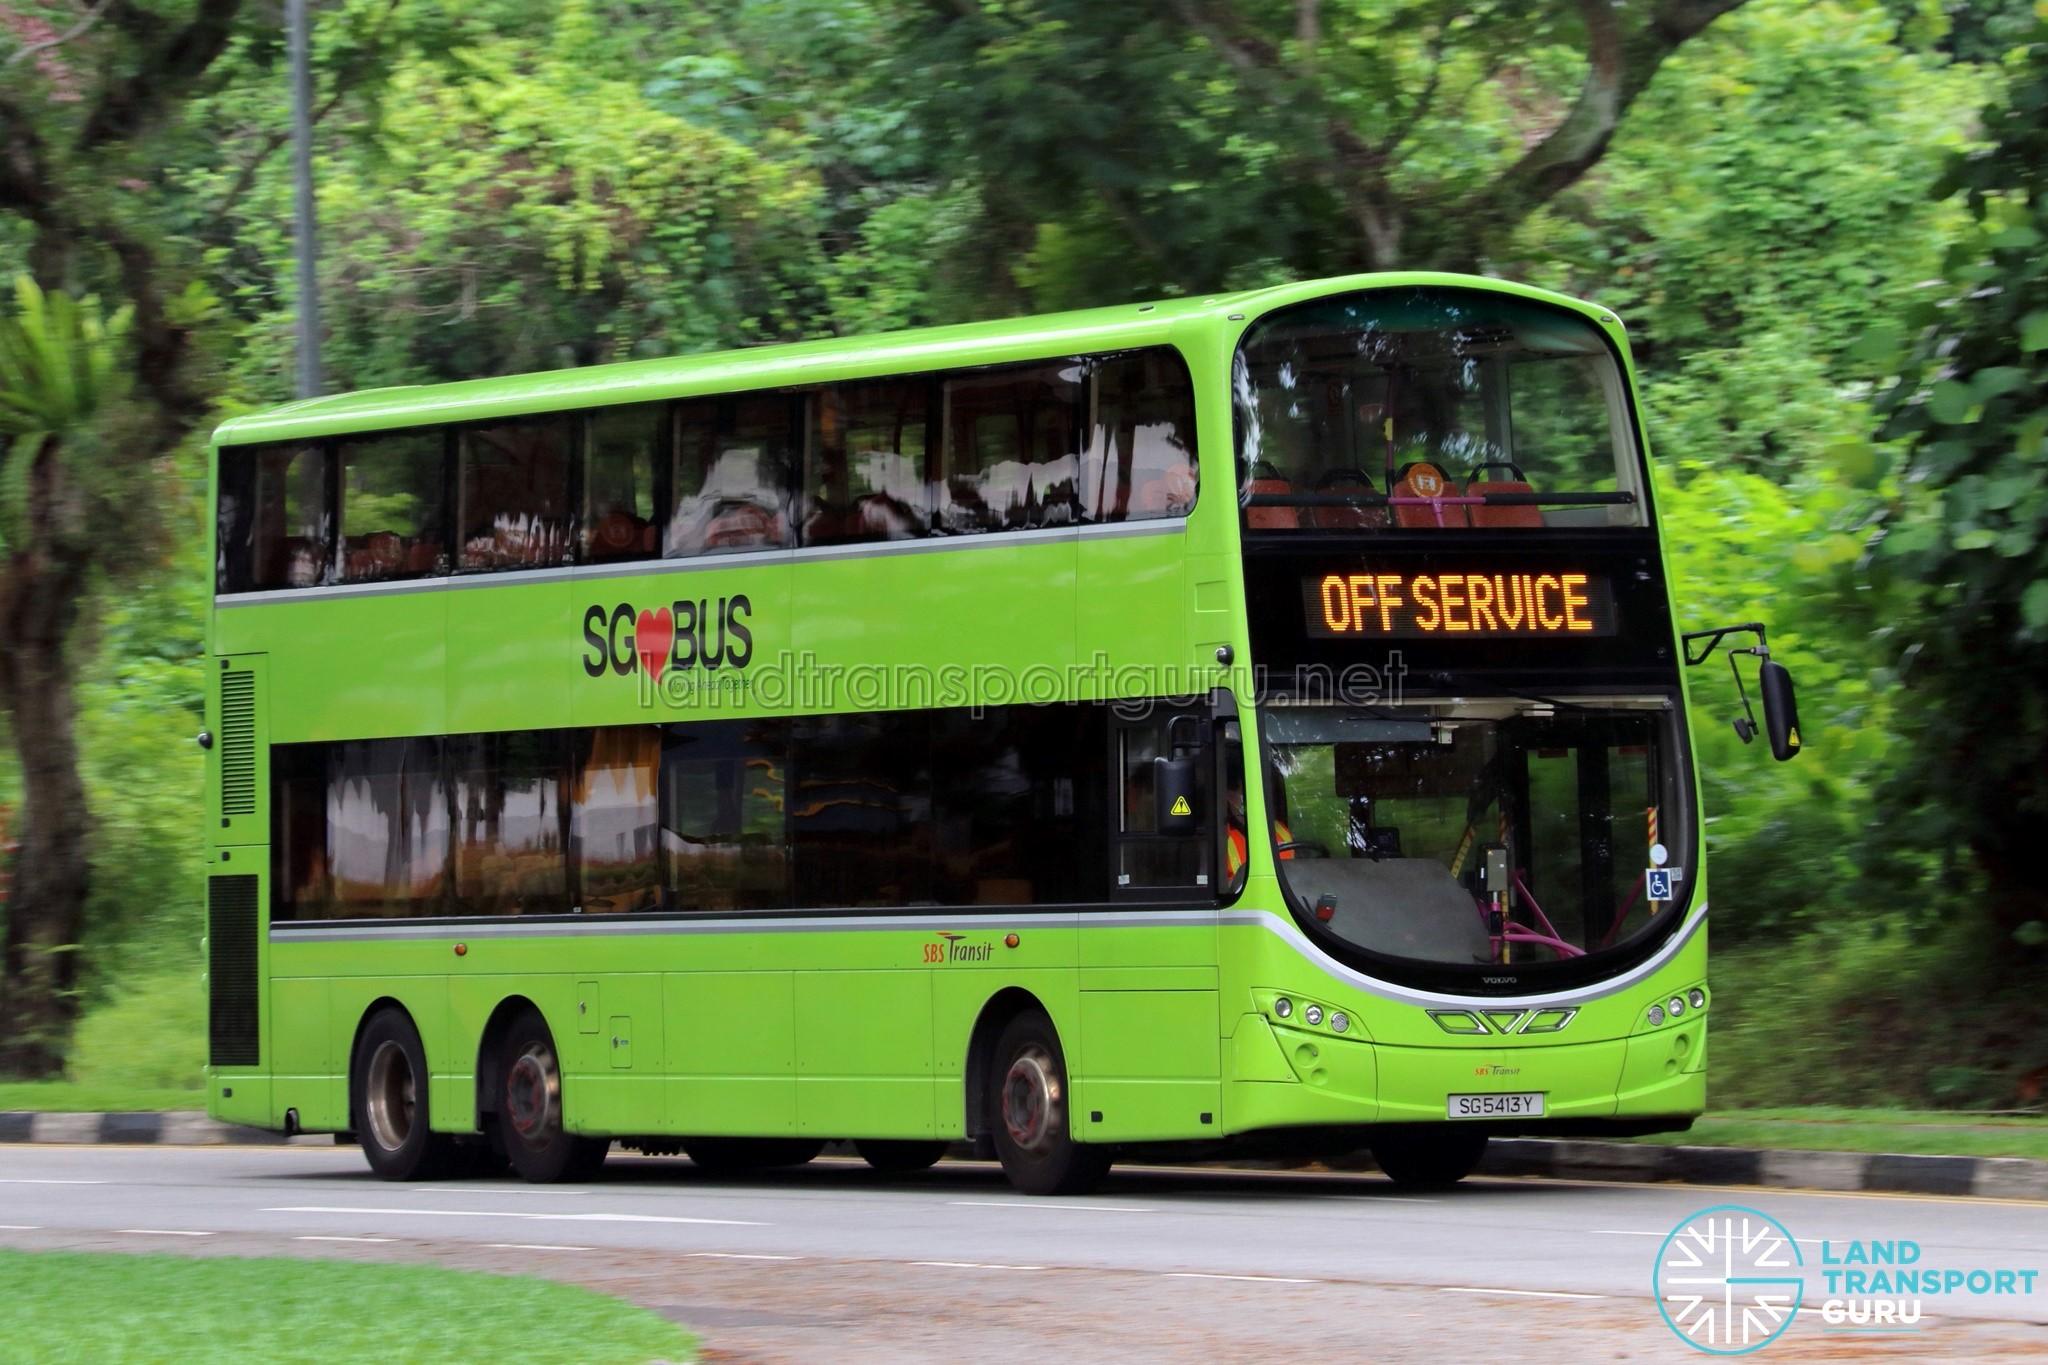 Suspension of Bus Services Post-Circuit Breaker